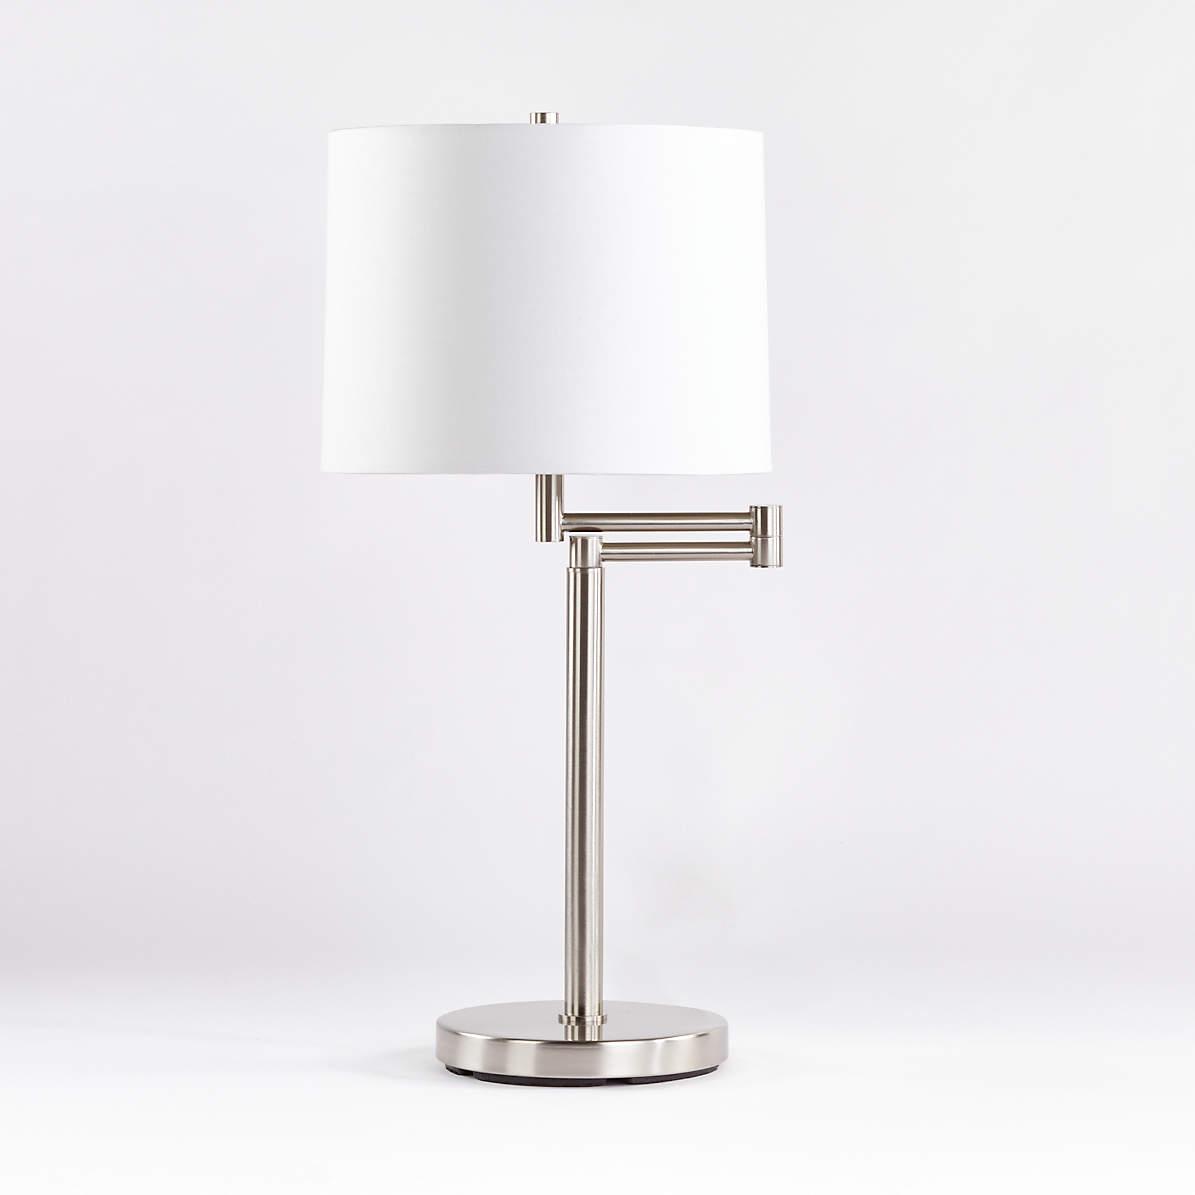 Metro Ii Brushed Nickel Swing Arm Table Lamp Reviews Crate And Barrel